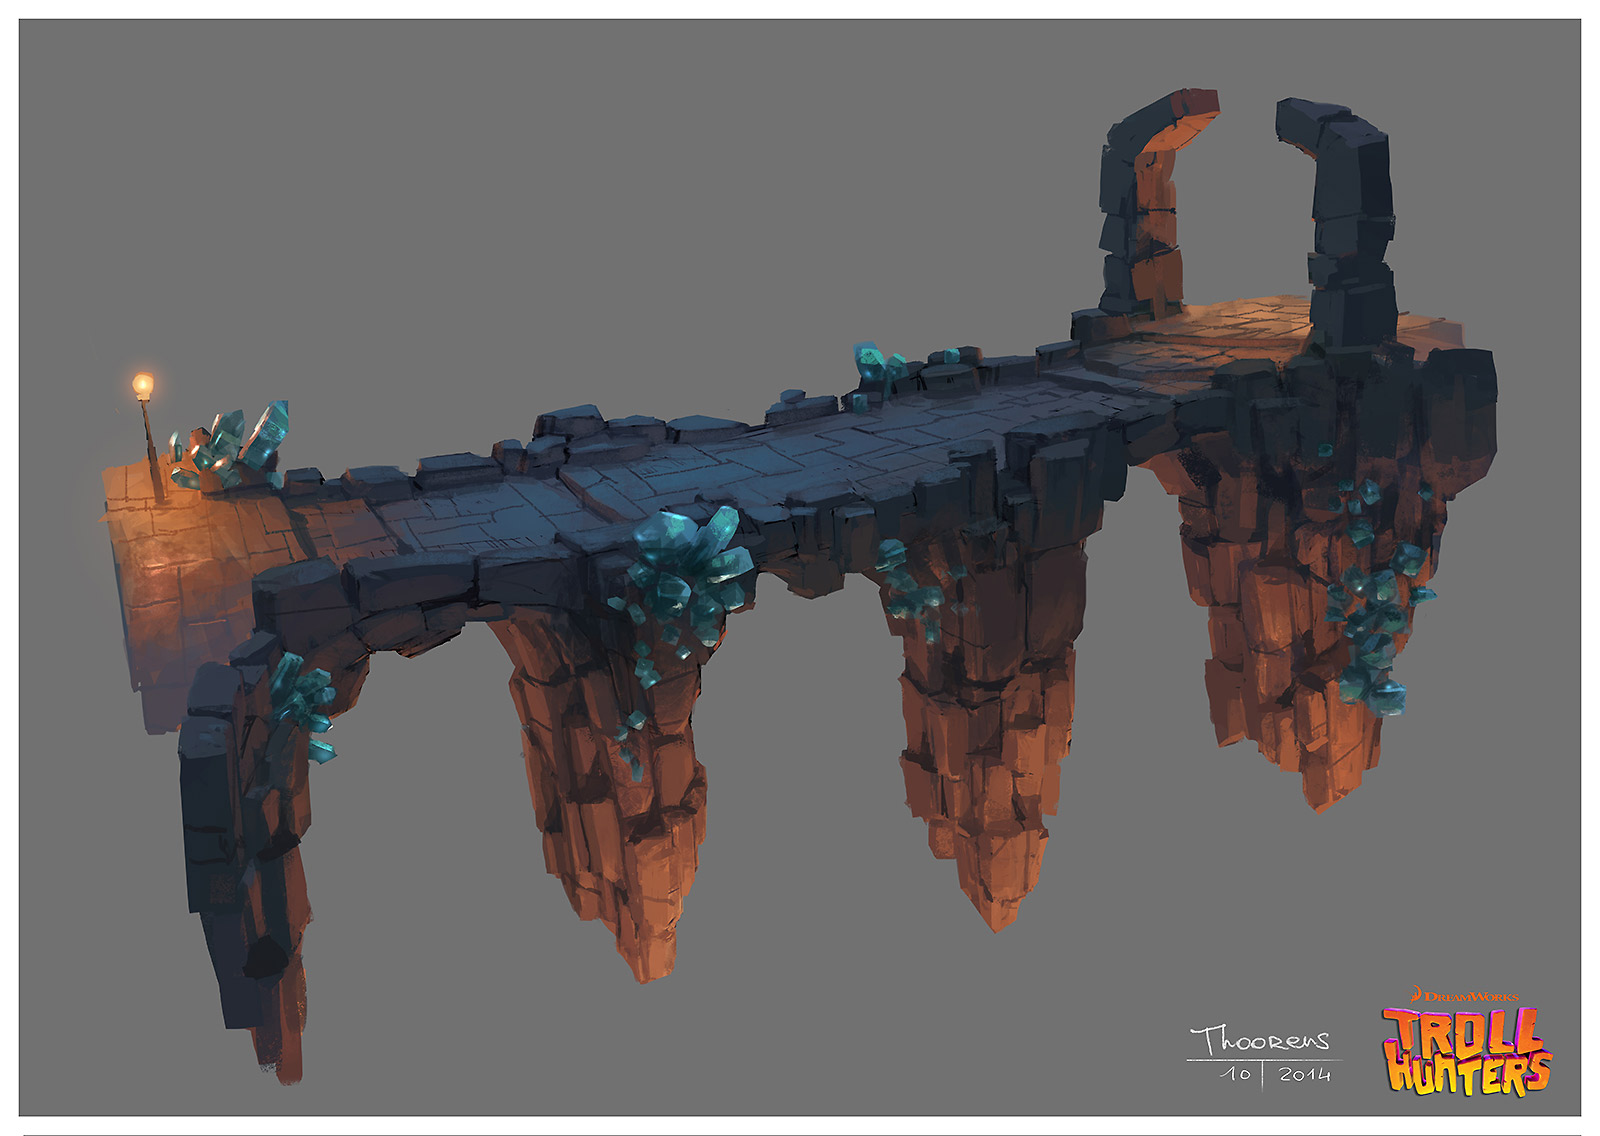 Trollhunters Concept Art by Geoffroy Thoorens